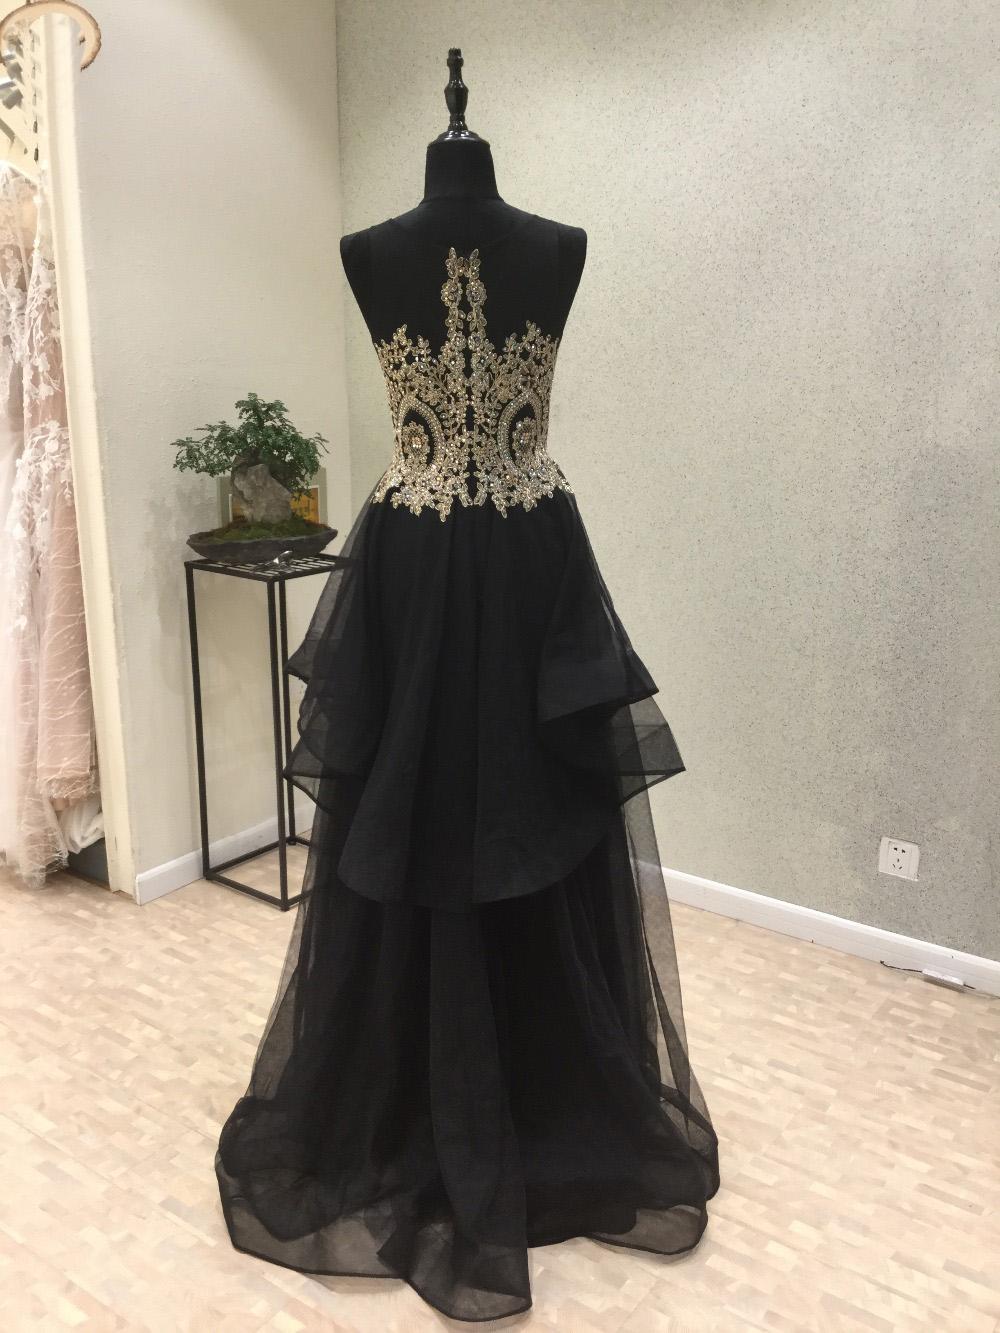 Black Organza Long Layer Homecoming Dress Golden Lace